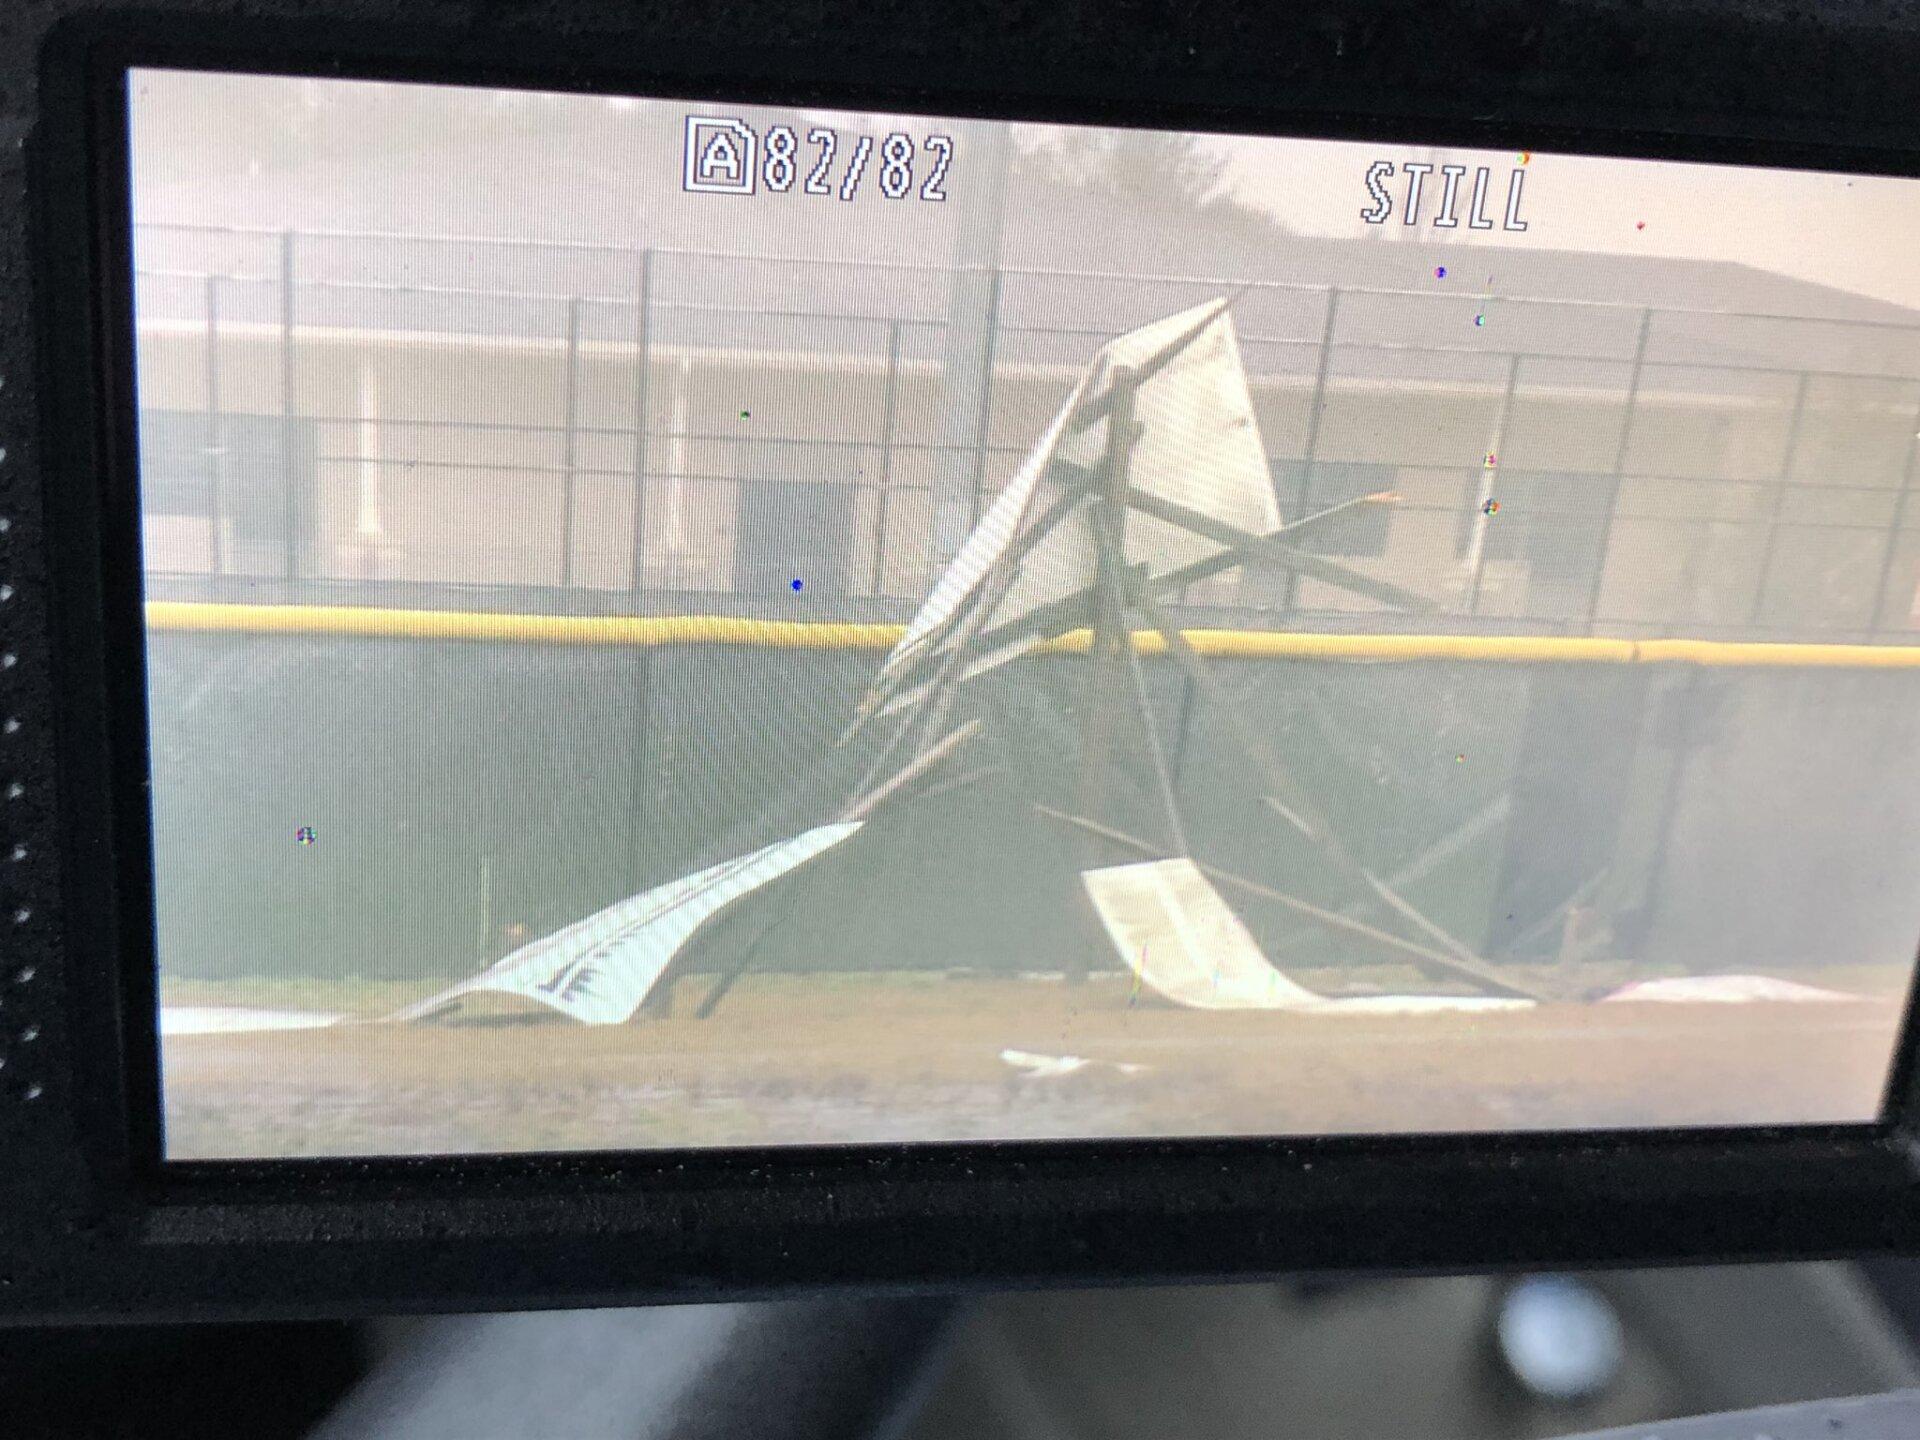 storm damage 5.jpg